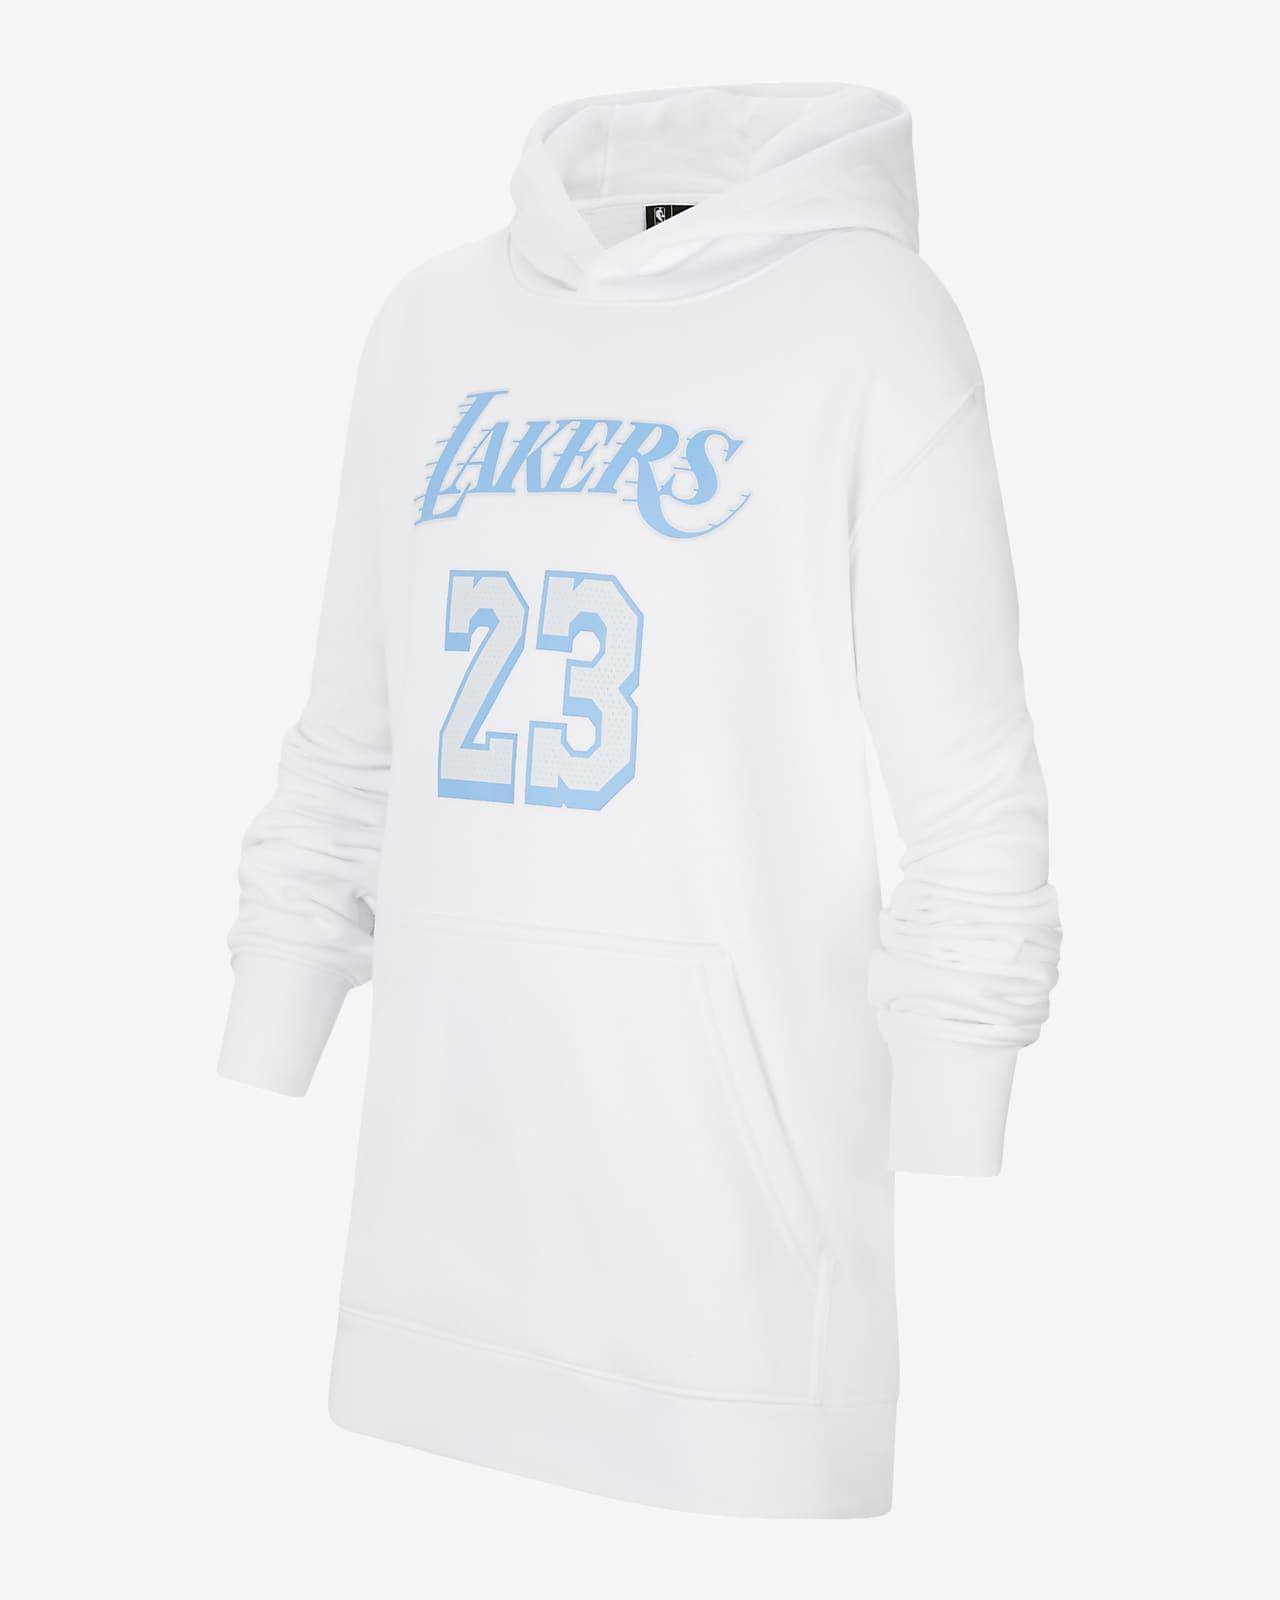 LeBron James Lakers City Edition Older Kids' Nike NBA Pullover Hoodie